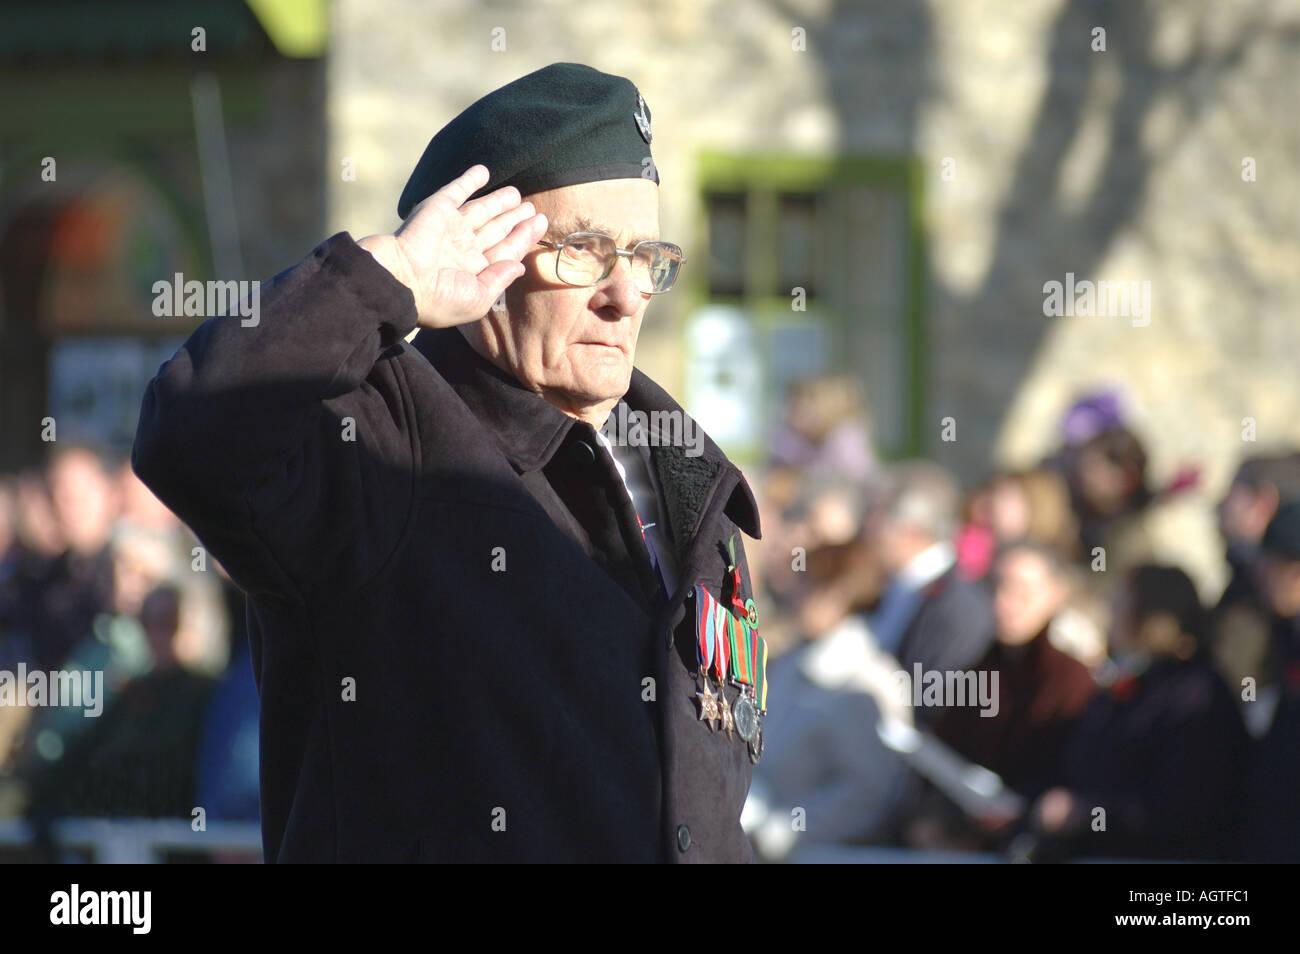 Veteran saluting on Remembrance Sunday - Stock Image